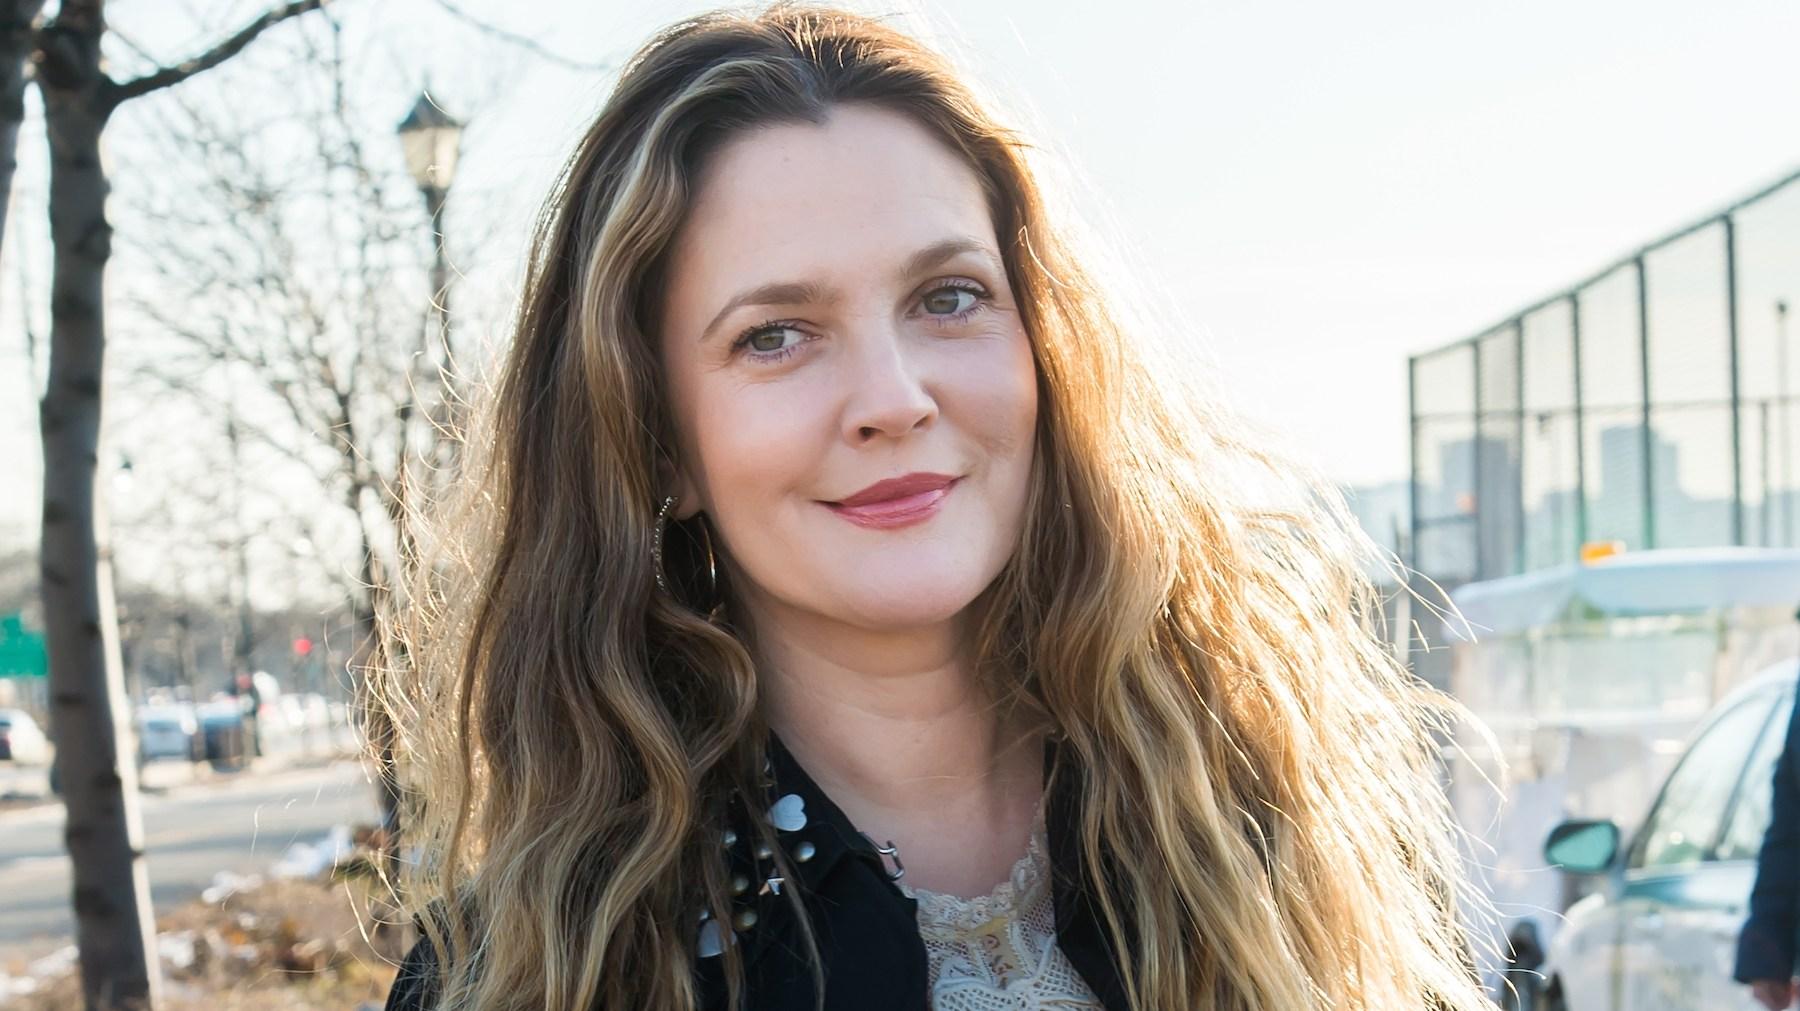 Drew Barrymore Reveals Gray Hair, Unplucked Eyebrows in Makeup-Free Selfie